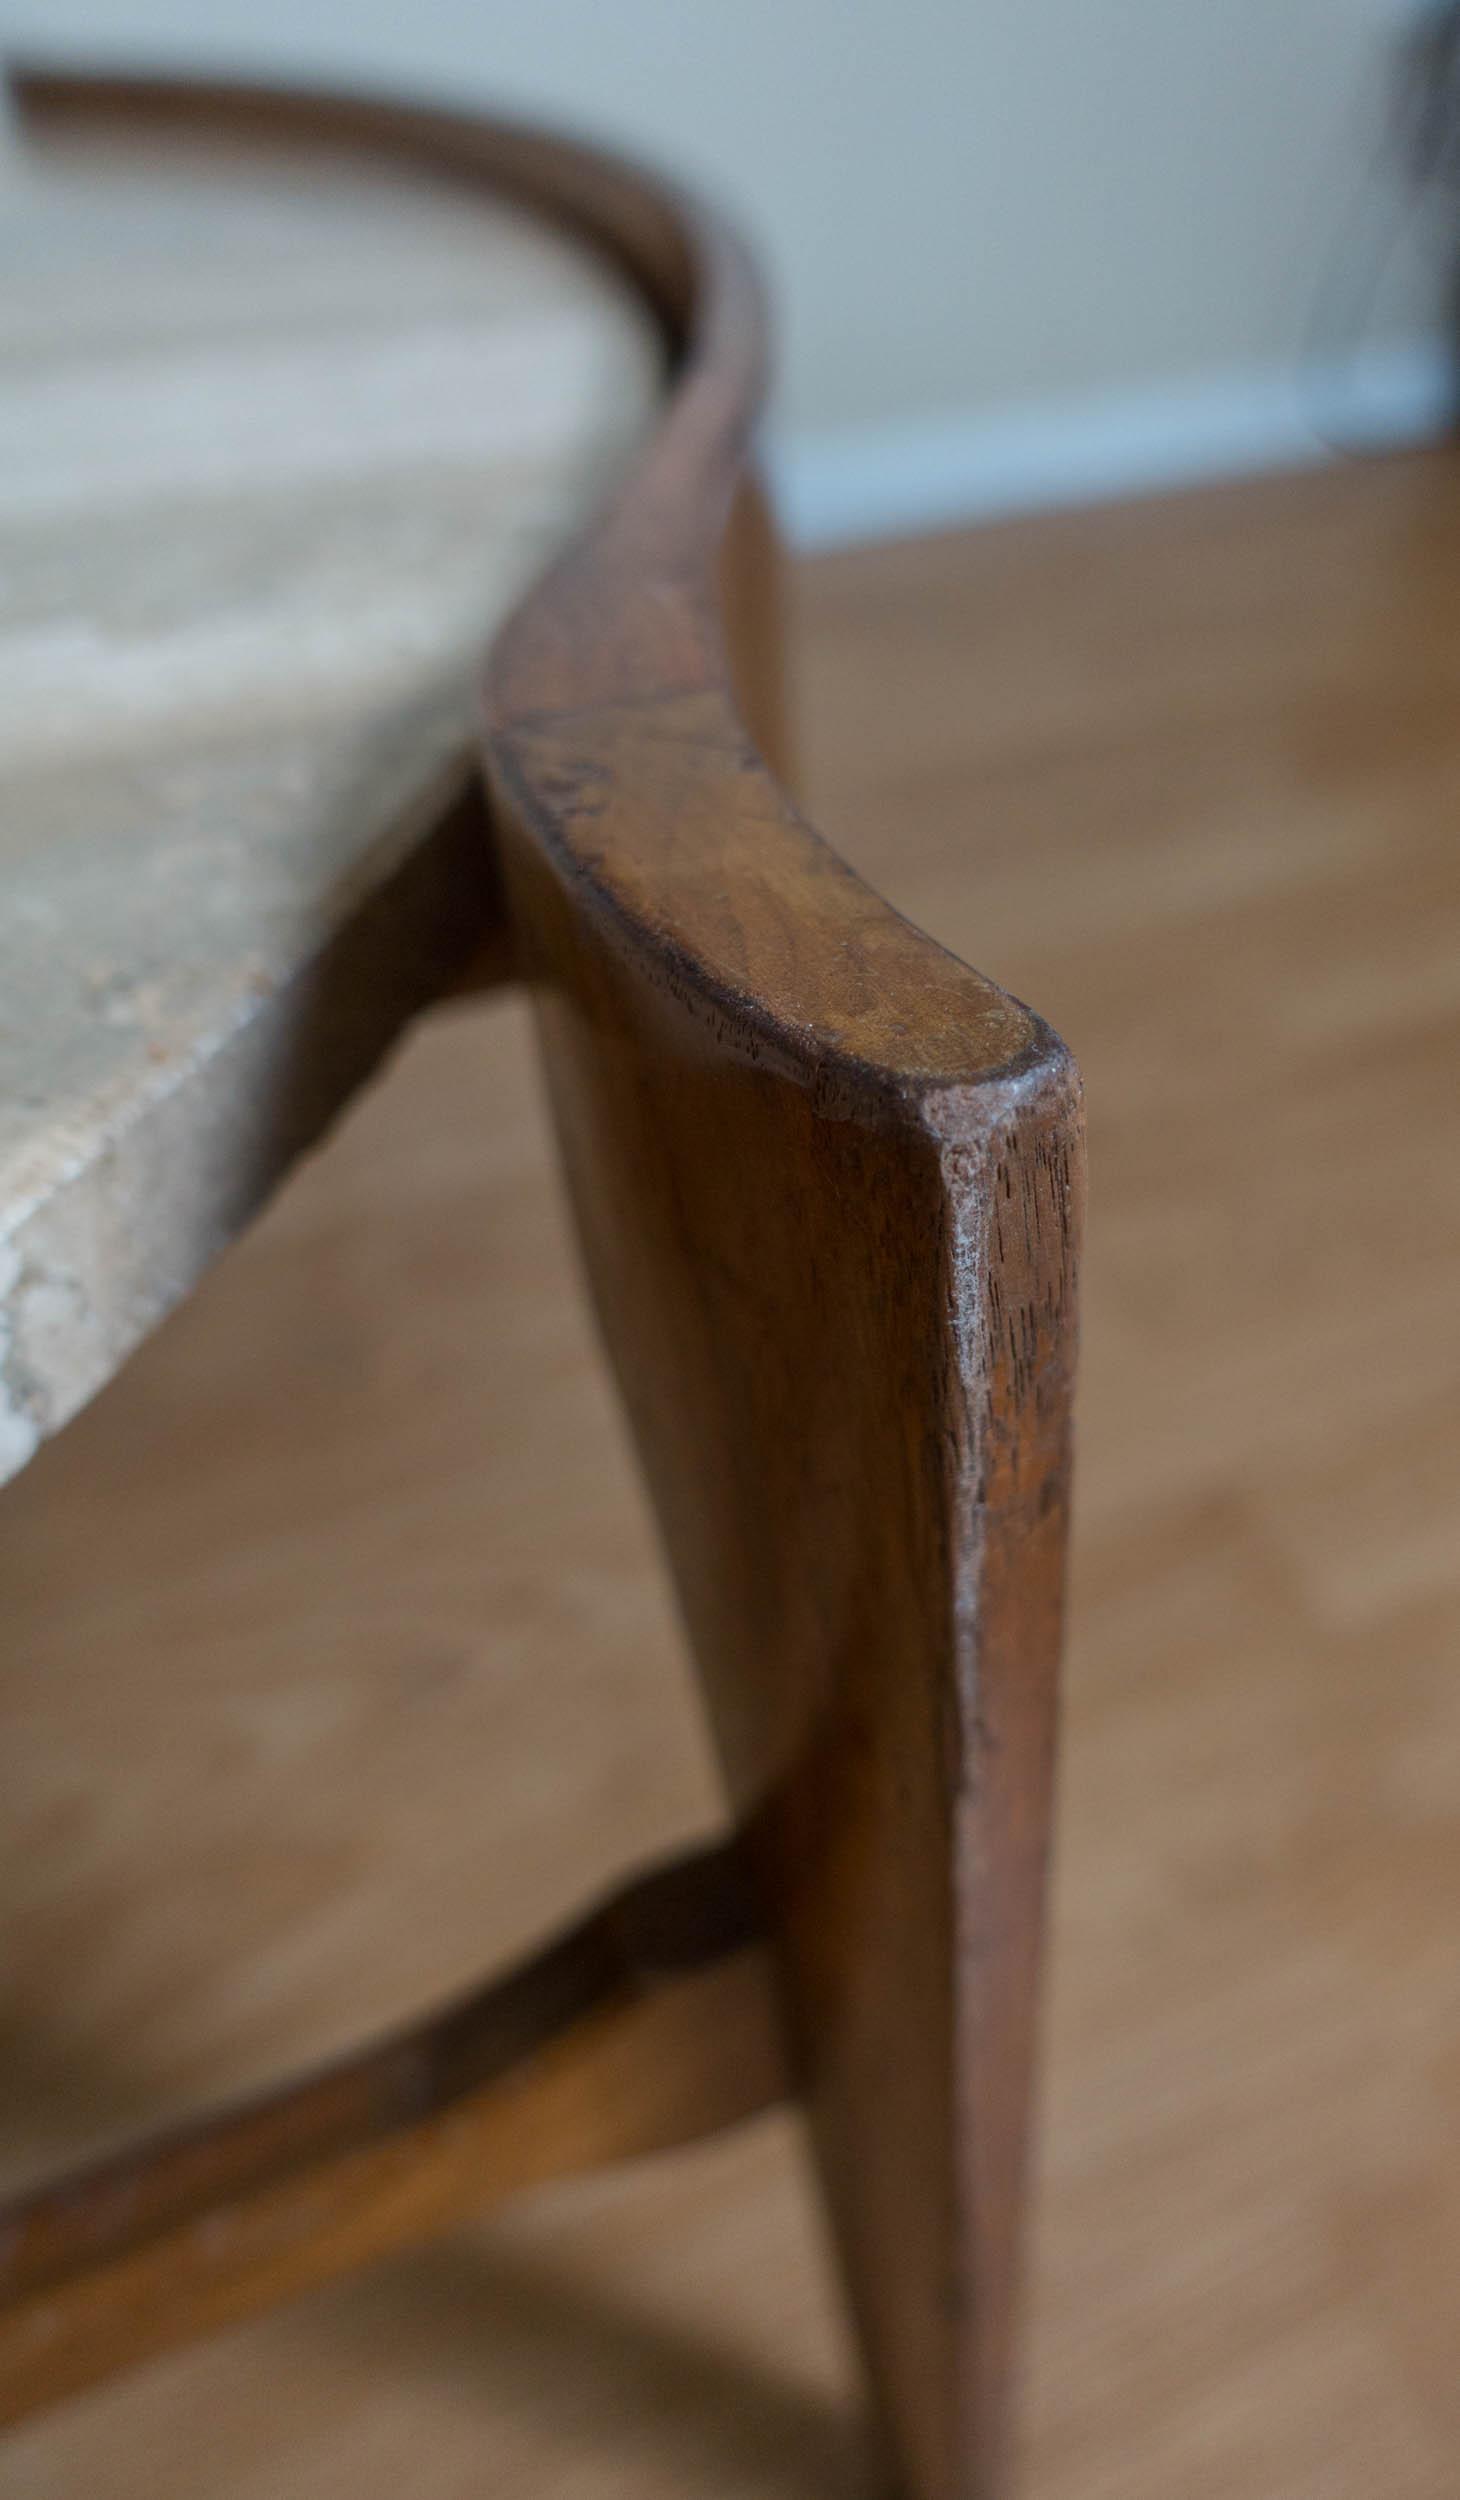 Bertha Schaefer Travertine amp Walnut Coffee Table Chairish : bertha schaefer travertine and walnut coffee table 2639aspectfitampwidth640ampheight640 from www.chairish.com size 640 x 640 jpeg 24kB